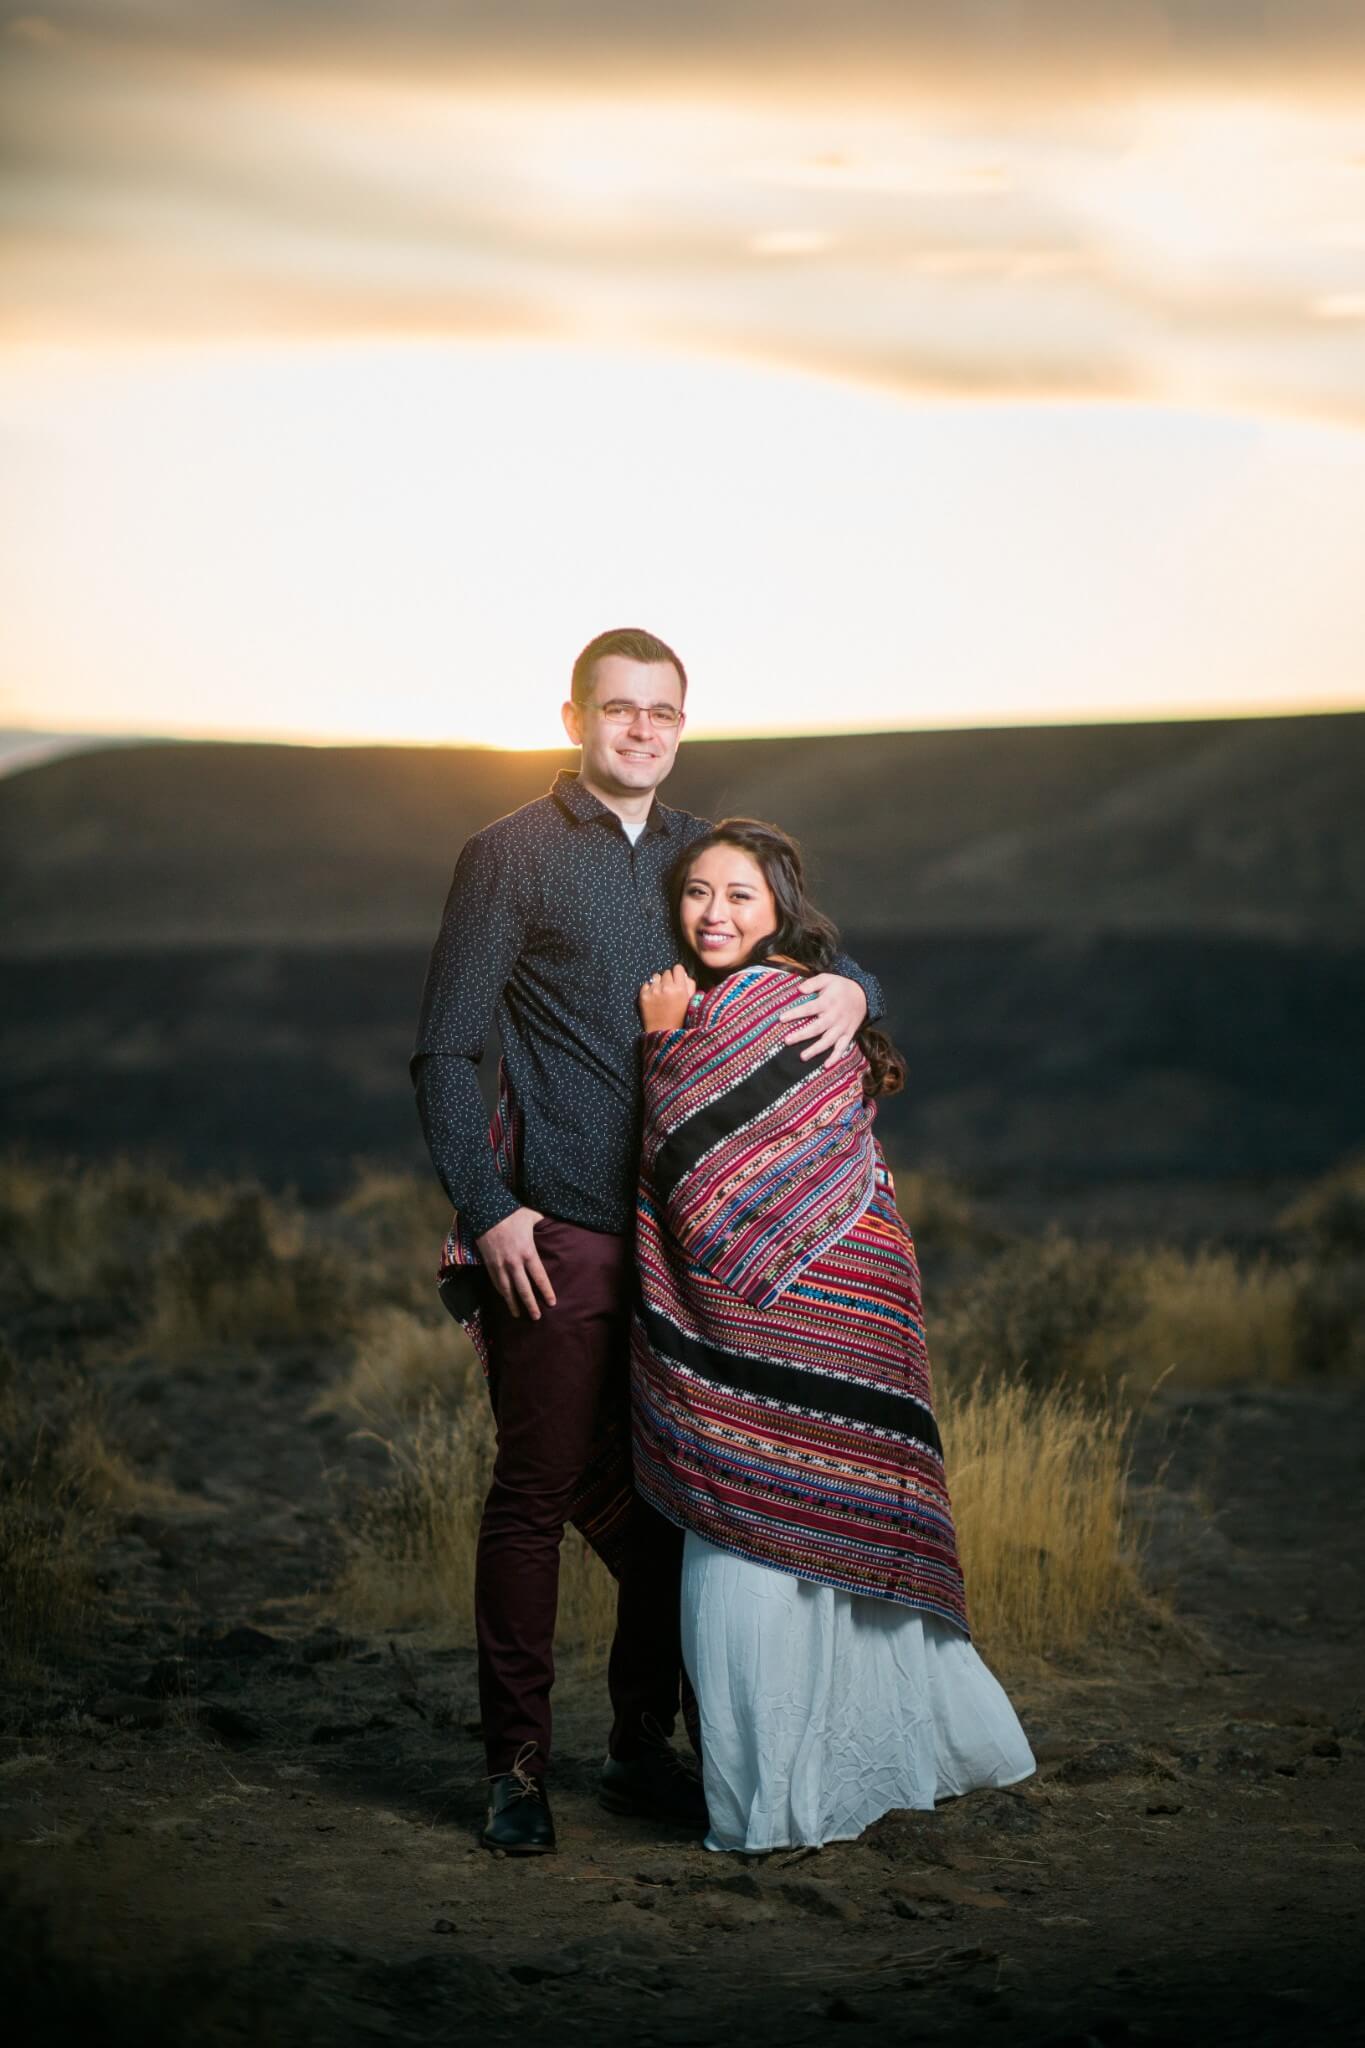 Lesly & Michael Vantage Engagement by Bill Weisgerber Spokane Photographer (62 of 71).jpg